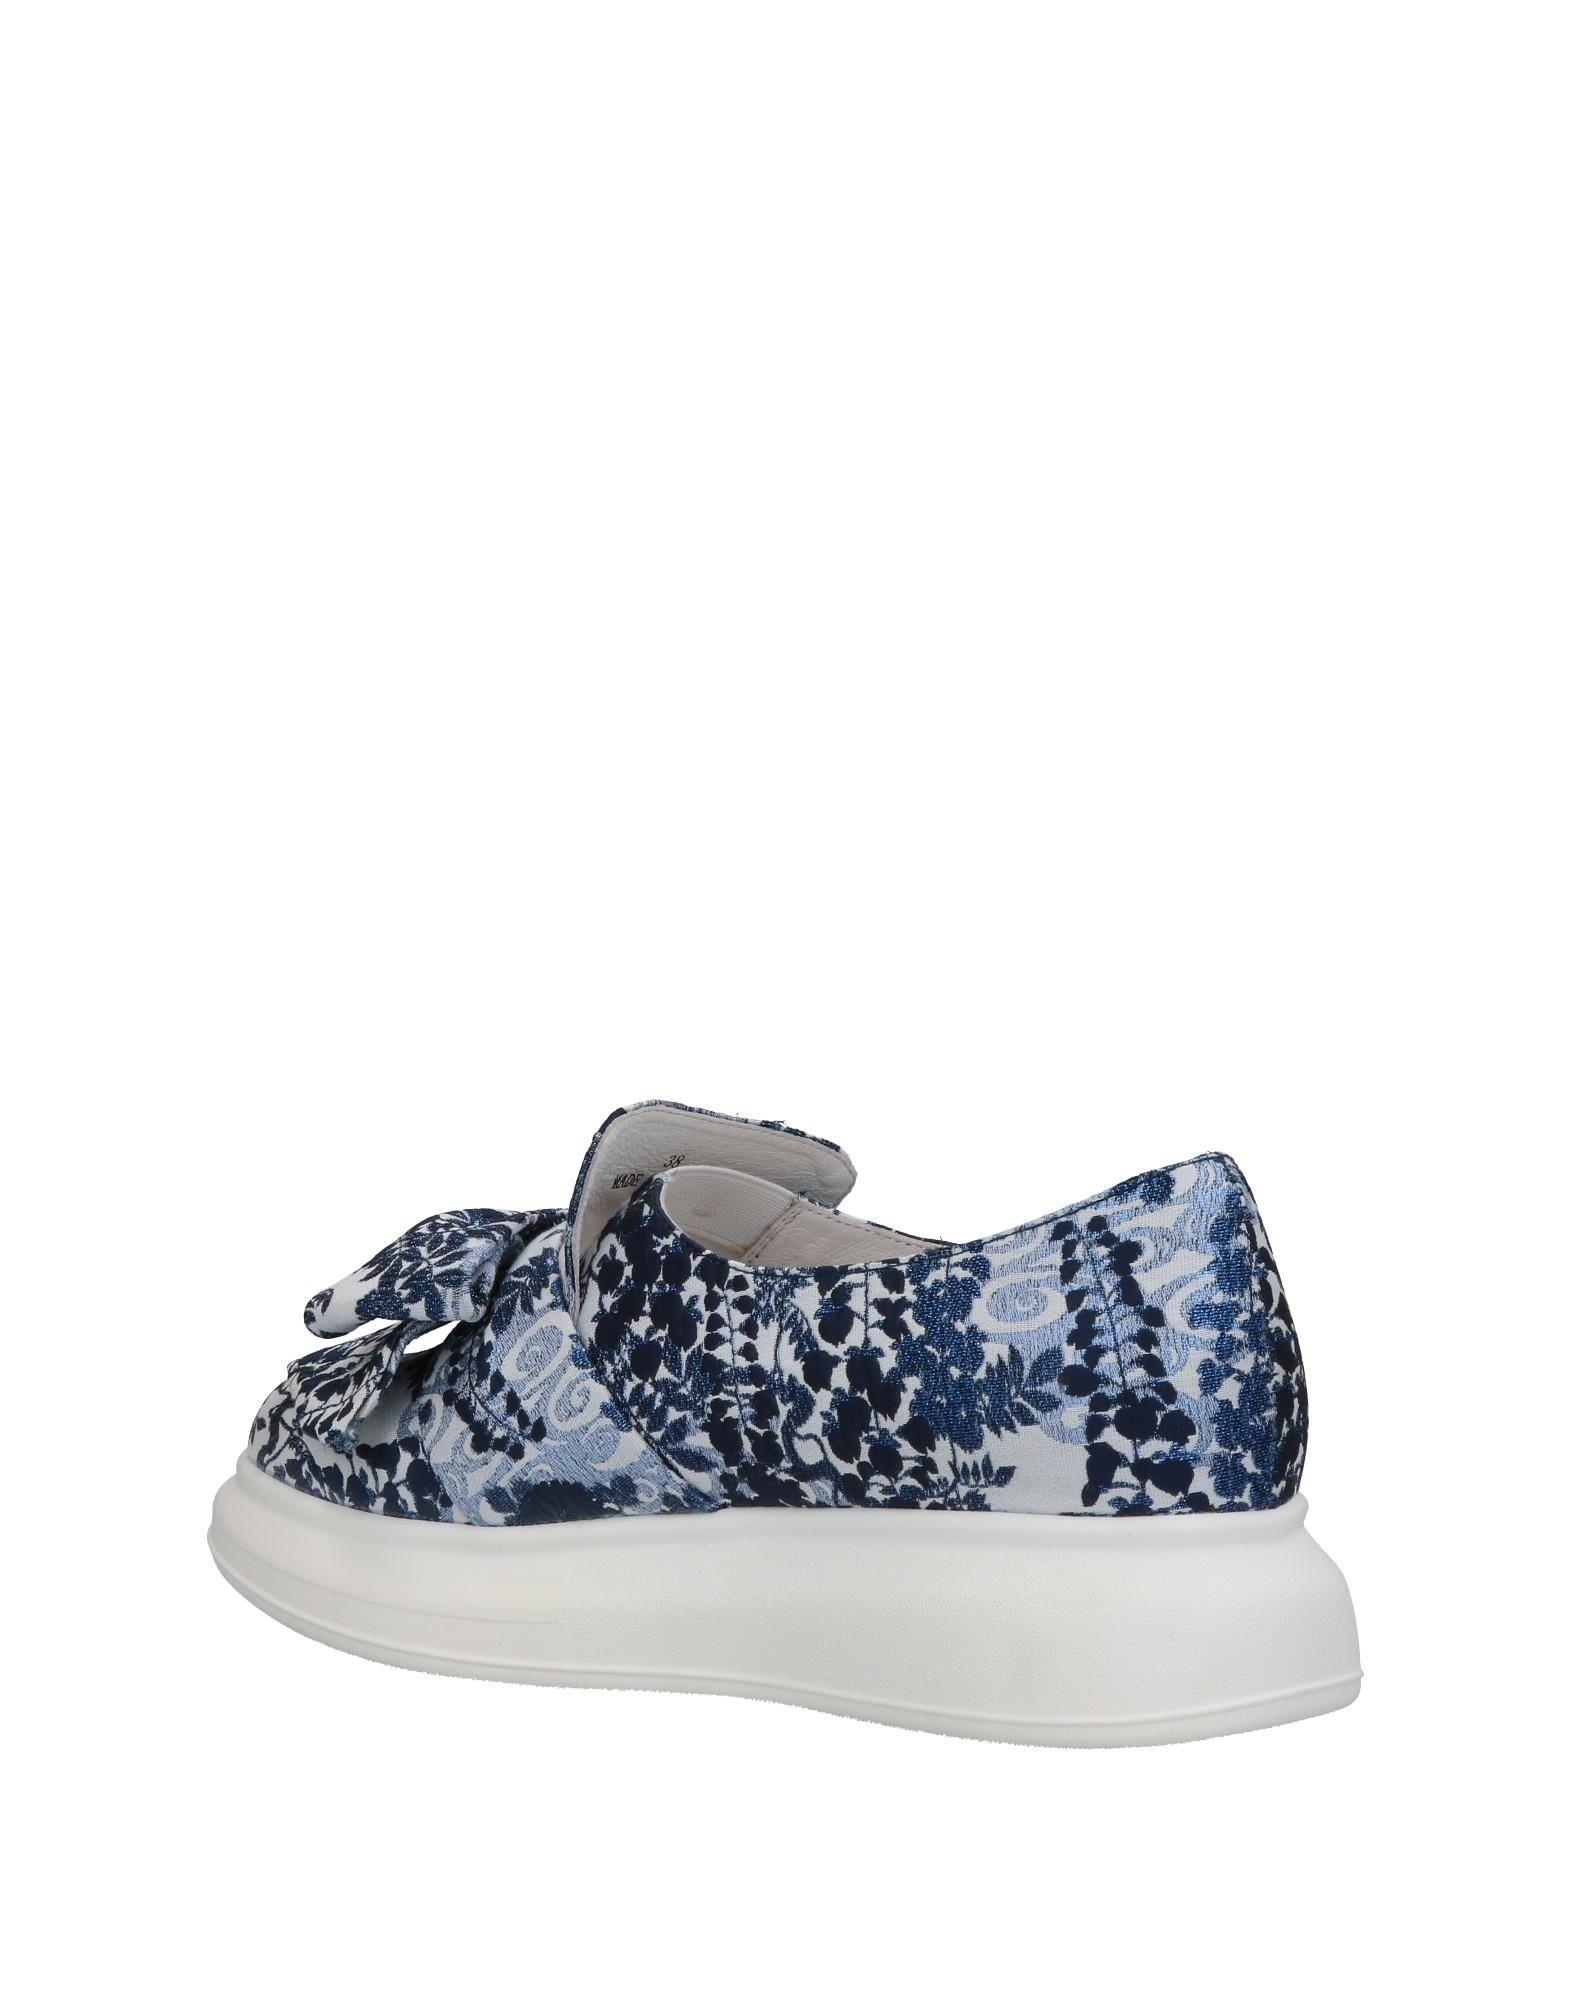 Jeffrey Campbell Sneakers Damen Damen Sneakers  11382164BJ 08104b